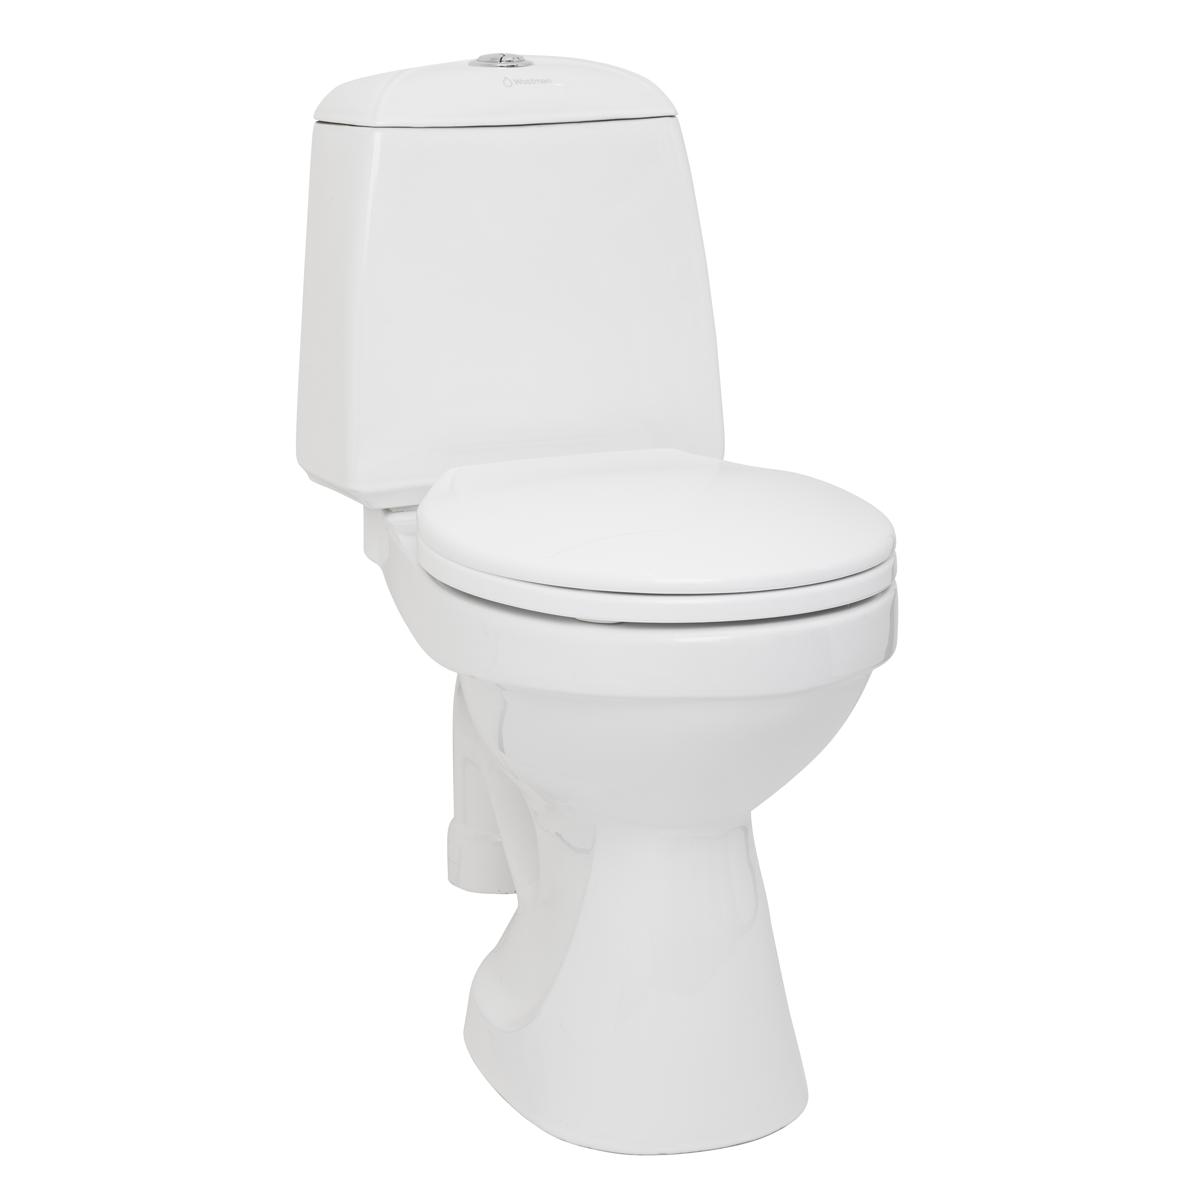 EcoFlush™urine diverting WC - > EcoFlush brochure> EcoFlush manual > EcoFlush user manual> EcoFlush troubleshooting